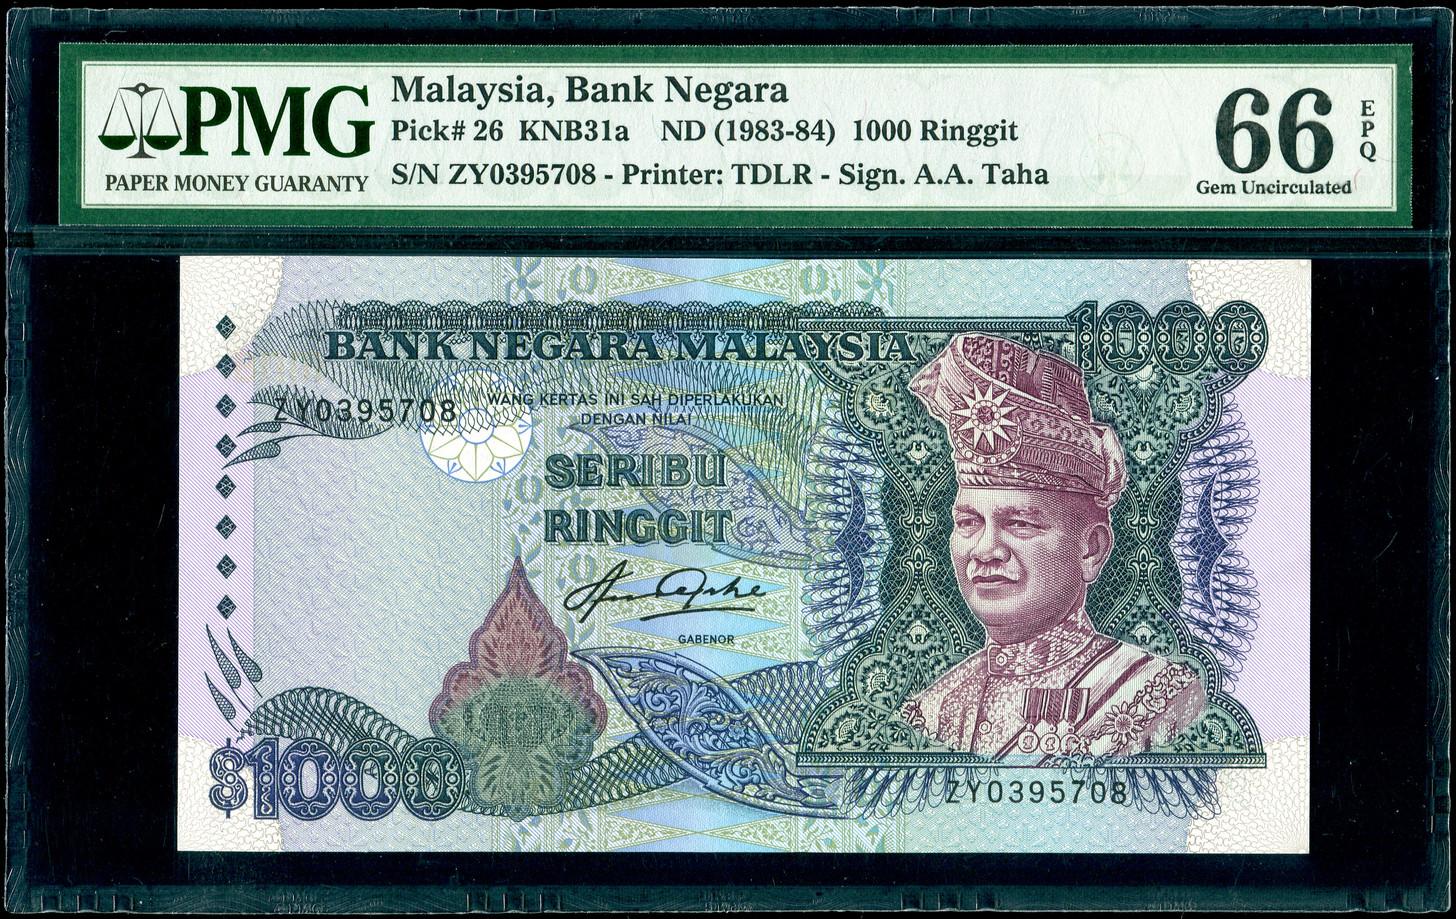 1000 Ringgit, 5th Series, Aziz Taha, PMG 66EPQ